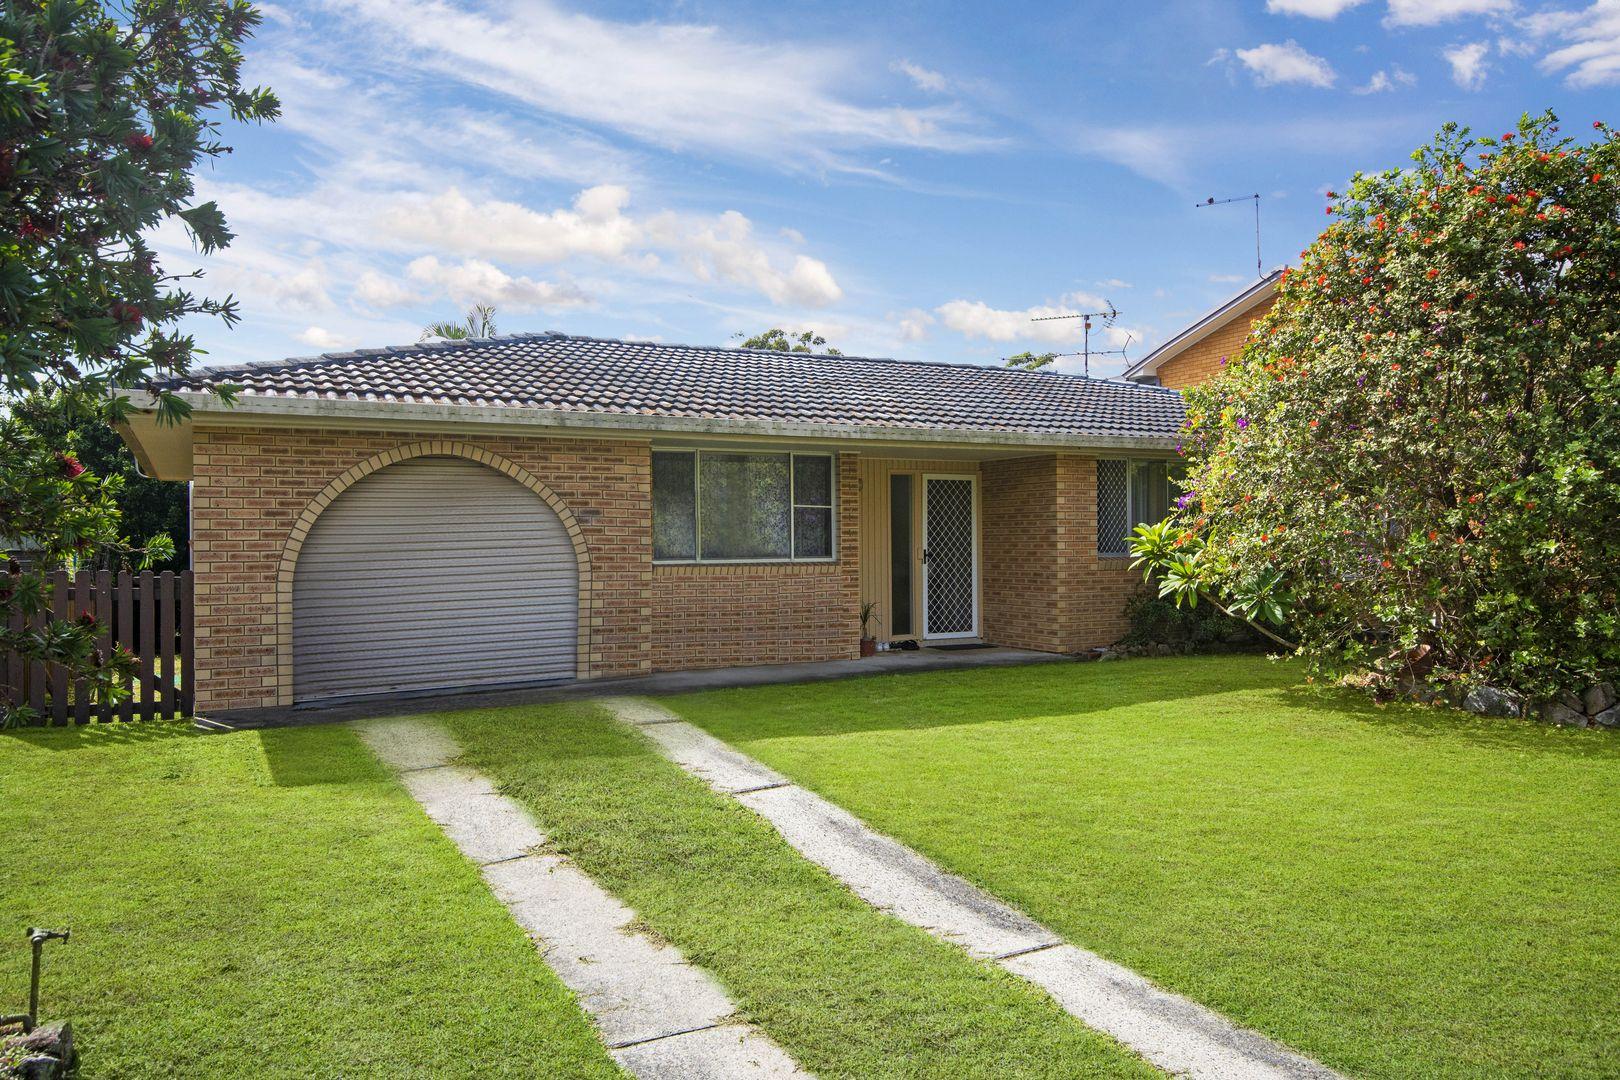 48 Coonawarra Court, Yamba NSW 2464, Image 0